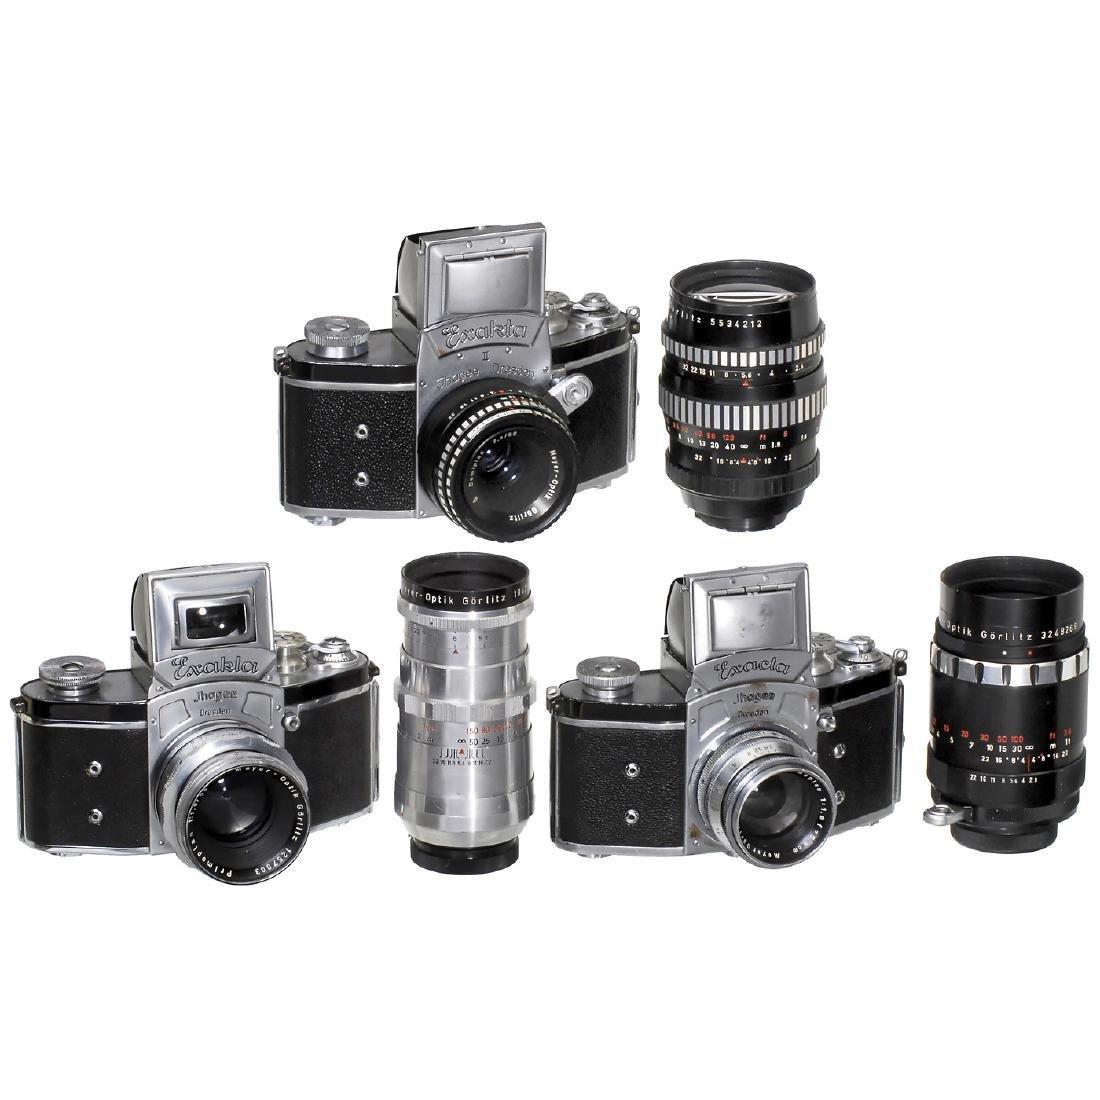 Kine-Exakta, Kine-Exacta, Exakta II and 6 Lenses